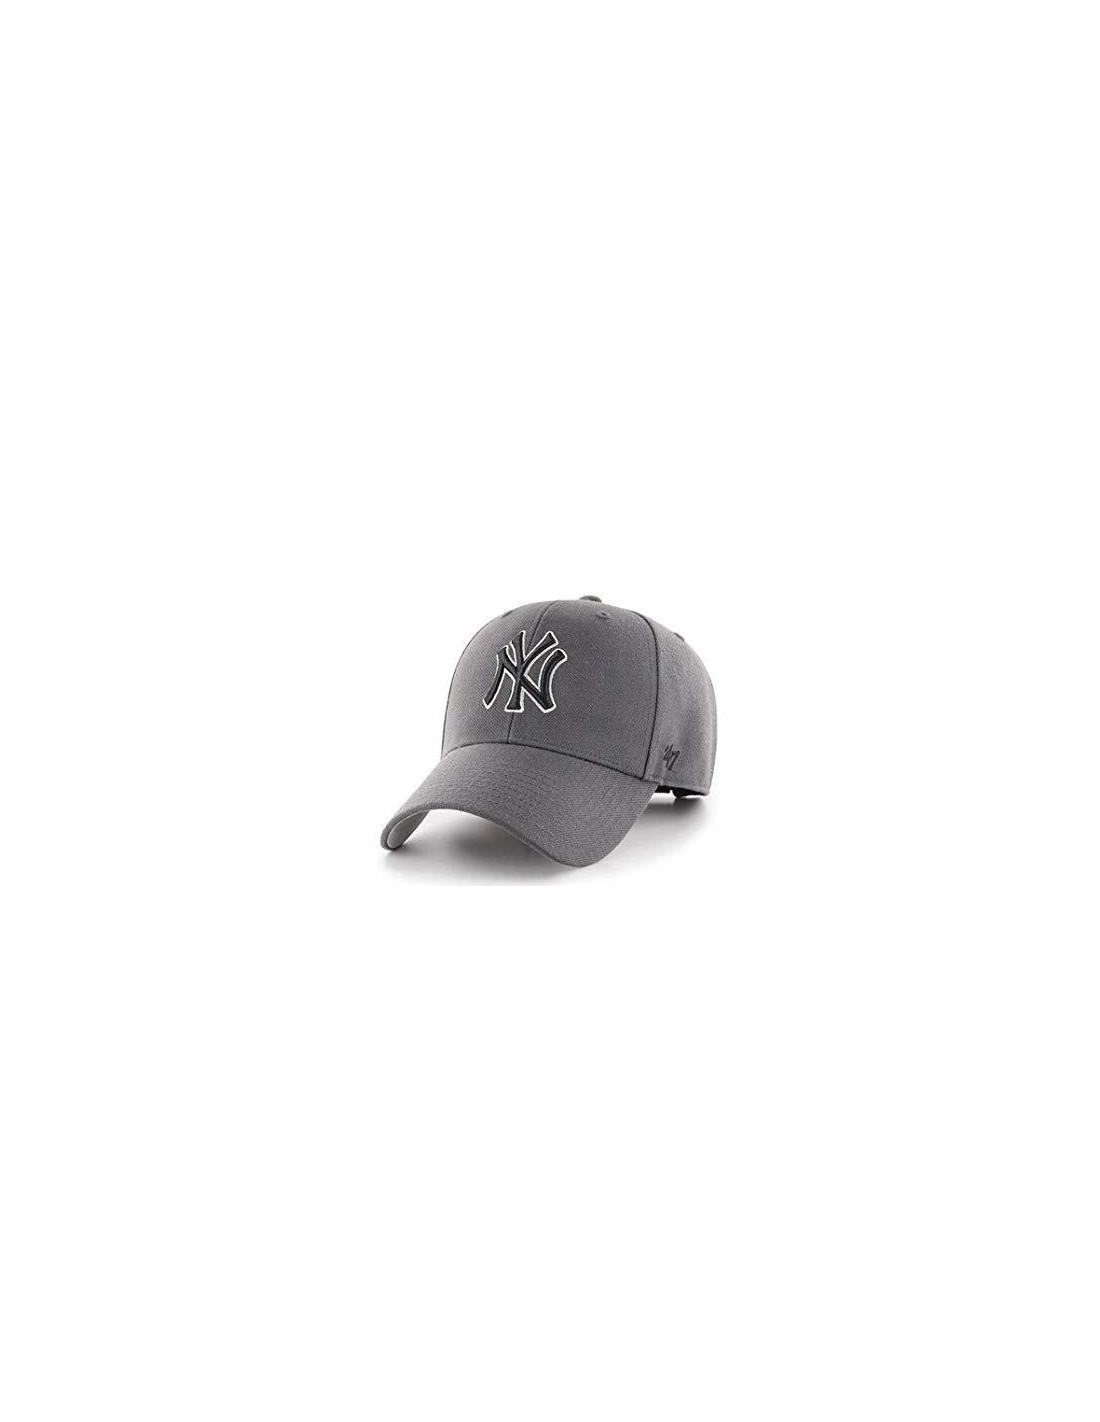 MLB New York Yankees 47 MVP Cap Ciemna popiel - Sport House Shop 5bd4a44f41c6